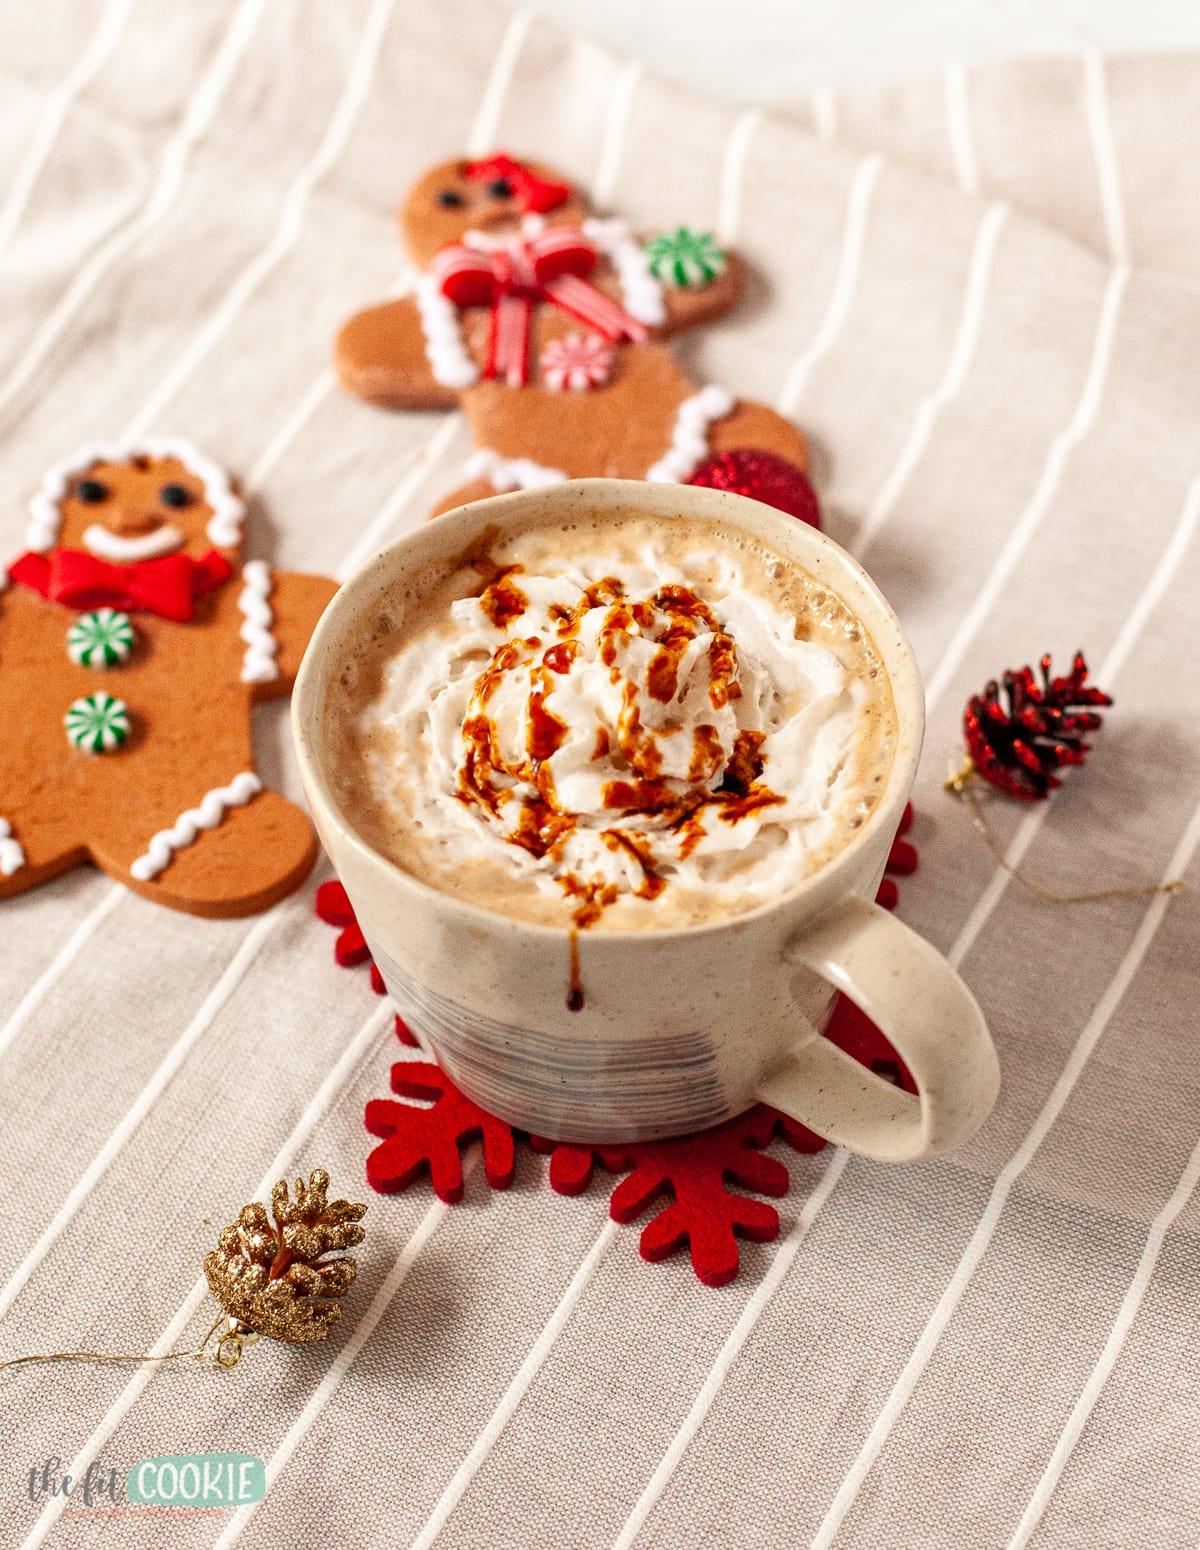 mug of gingerbread latte on a striped napkin